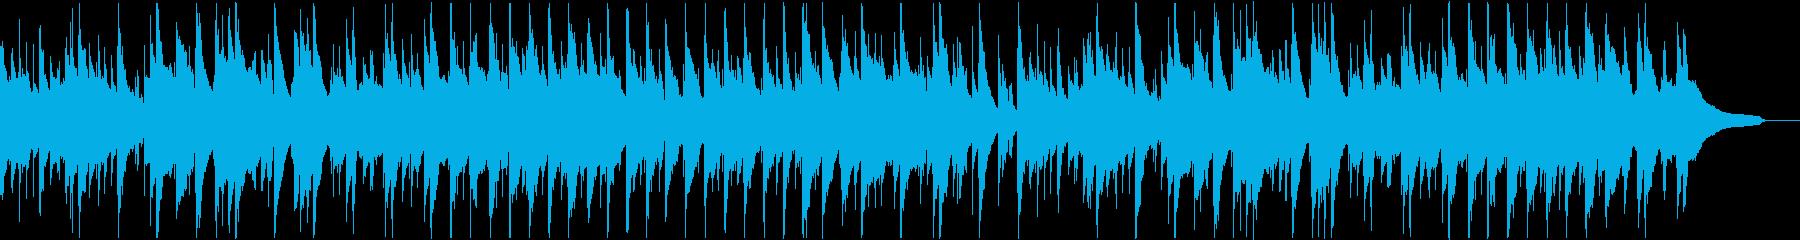 【YouTube】おしゃれなアコギの日常の再生済みの波形